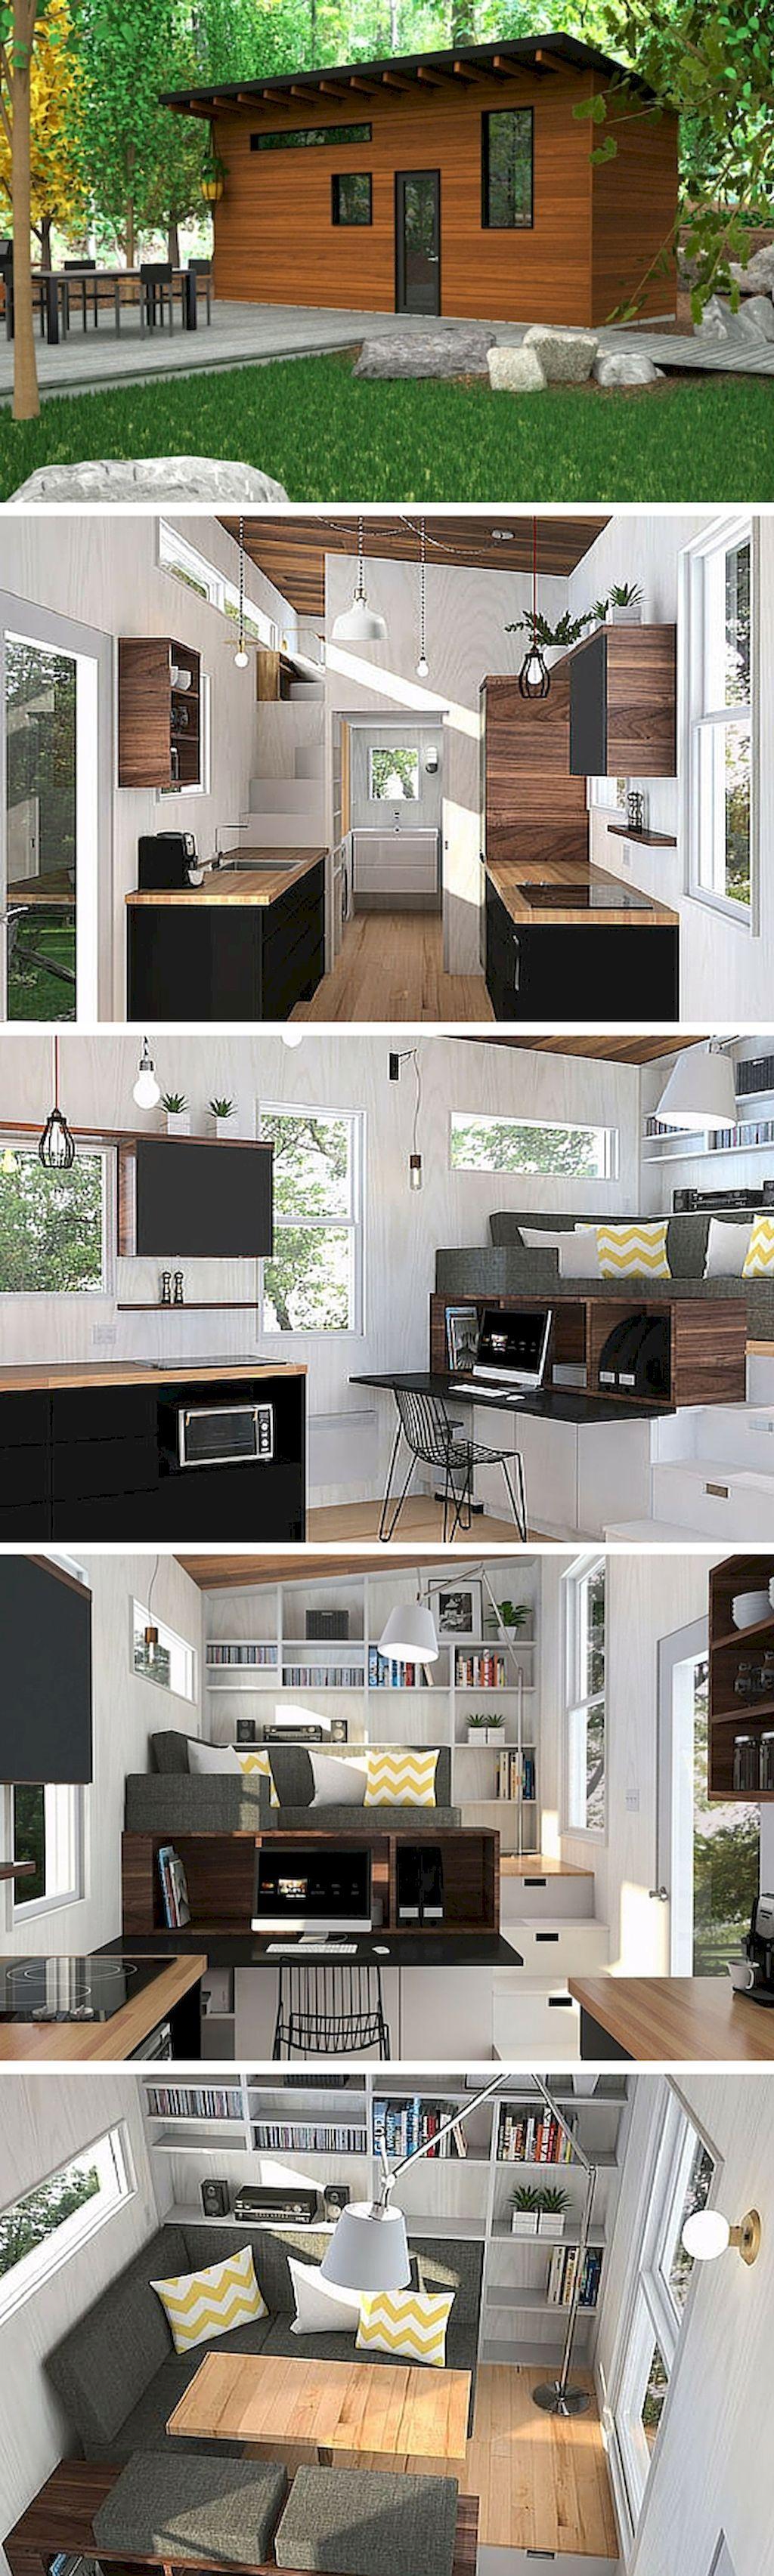 Awesome 60 Smart Tiny House Ideas and